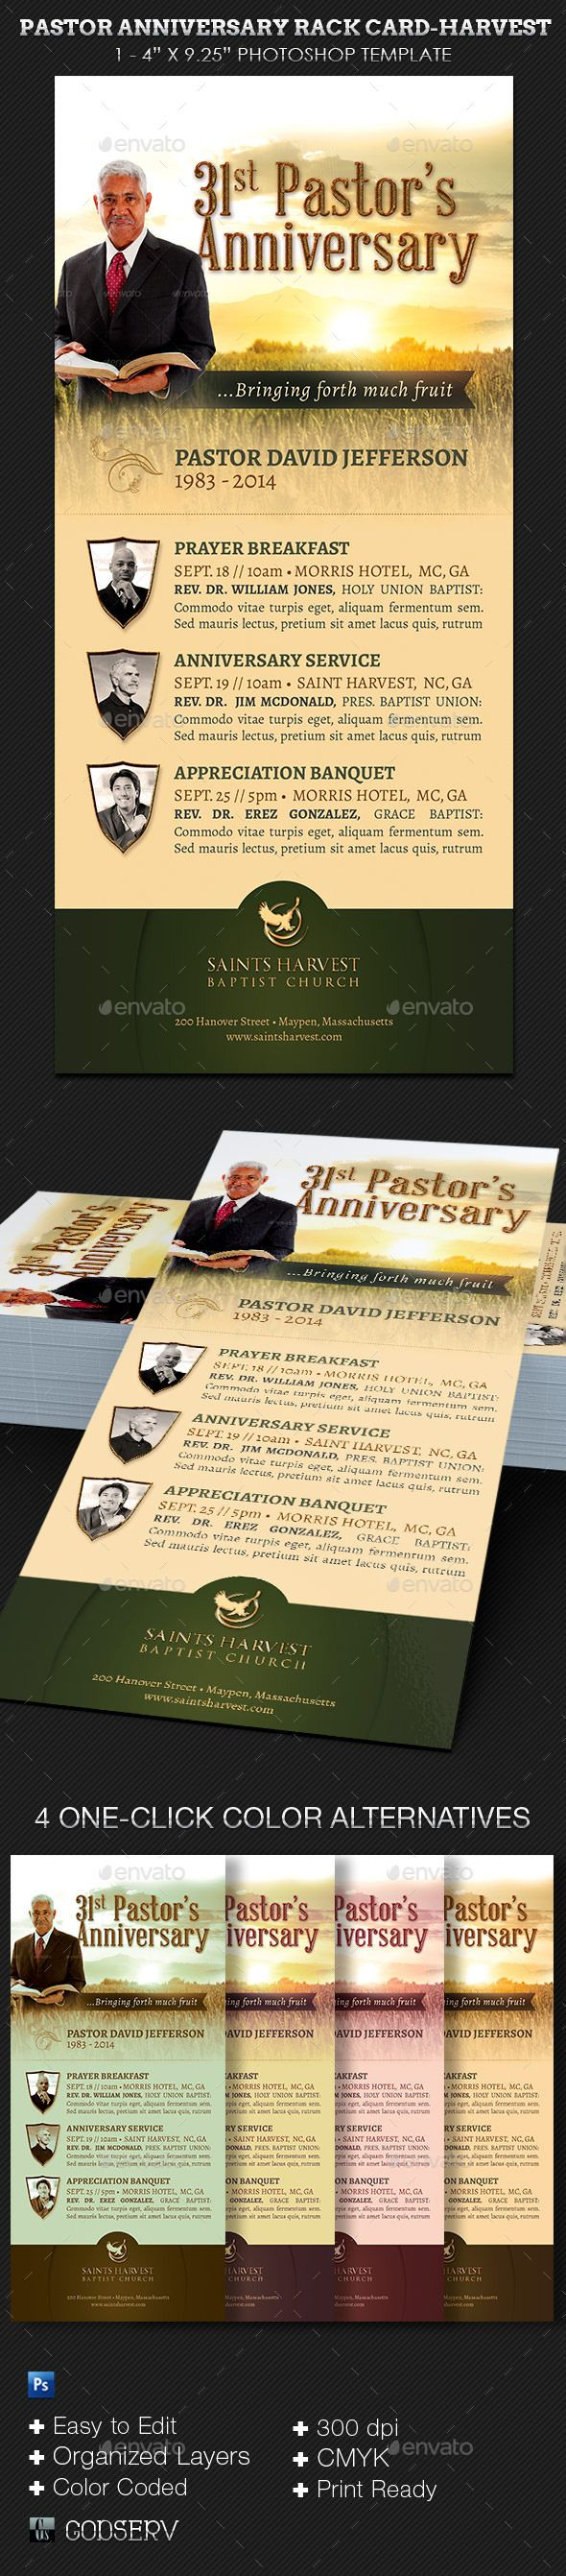 Pastor Anniversary Harvest Rack Card Template — Photoshop PSD #rack card #godserv • Available here → https://graphicriver.net/item/pastor-anniversary-harvest-rack-card-template/8846350?ref=pxcr